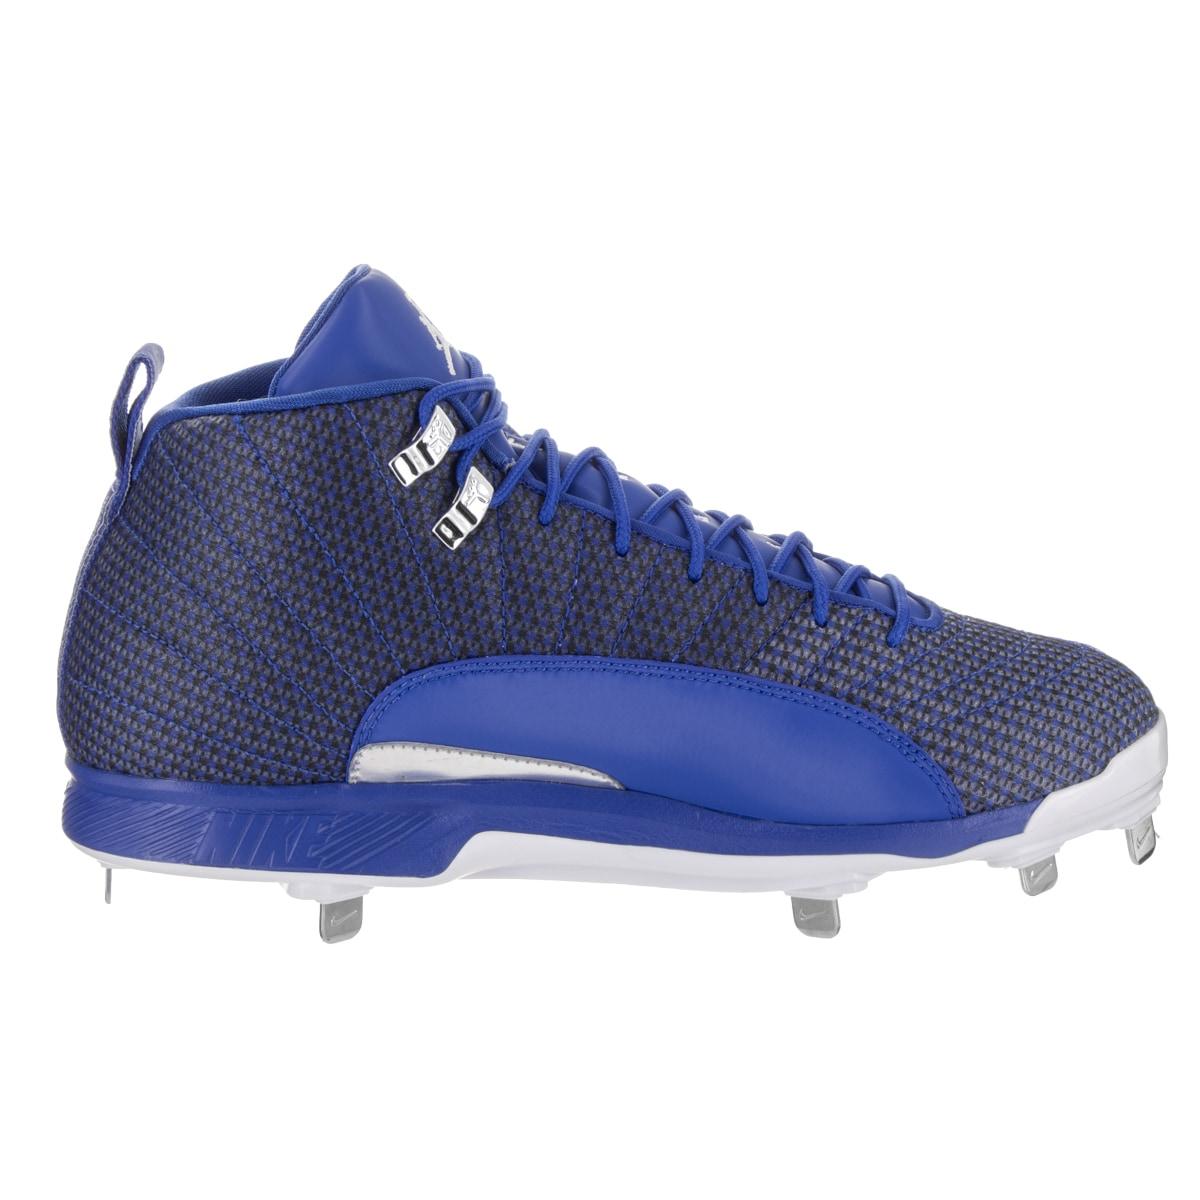 the latest 4630b 337e0 Shop Nike Jordan Men s Jordan XII Retro Metal Baseball Cleats - Free  Shipping Today - Overstock - 13831228